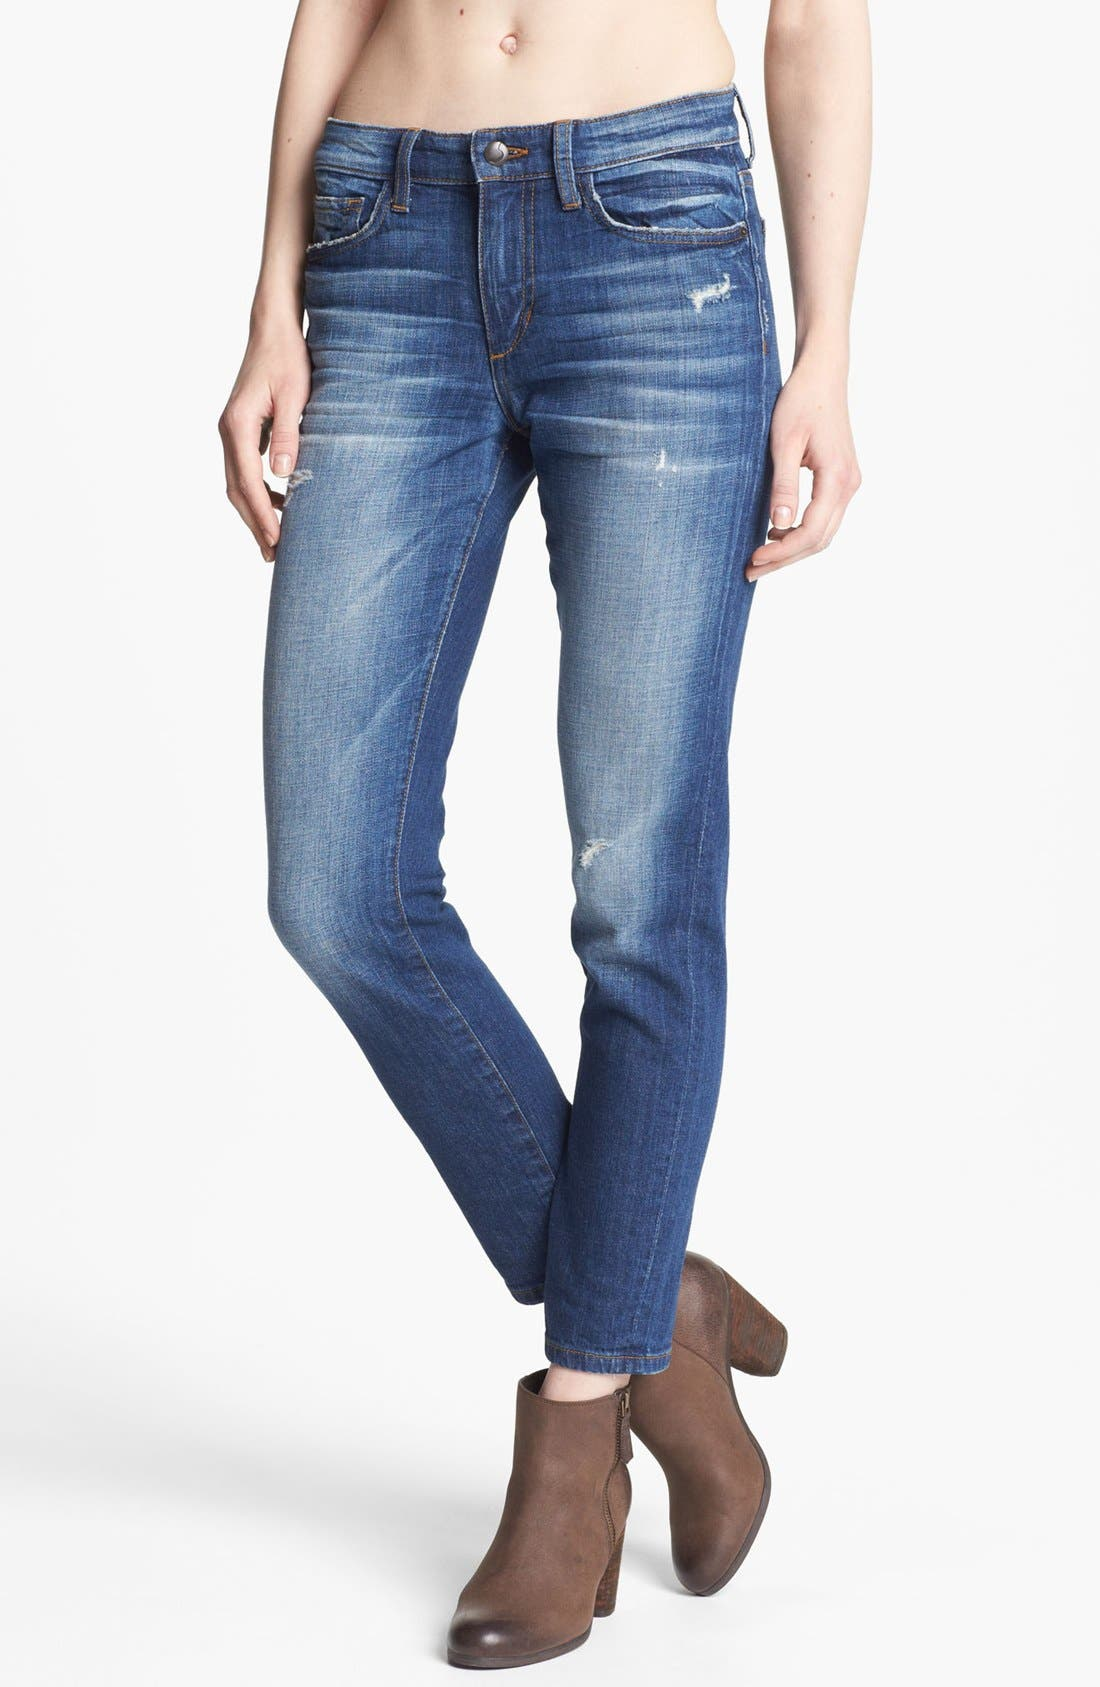 Alternate Image 1 Selected - Joe's 'The High Water' Ankle Jeans (Elyssa)